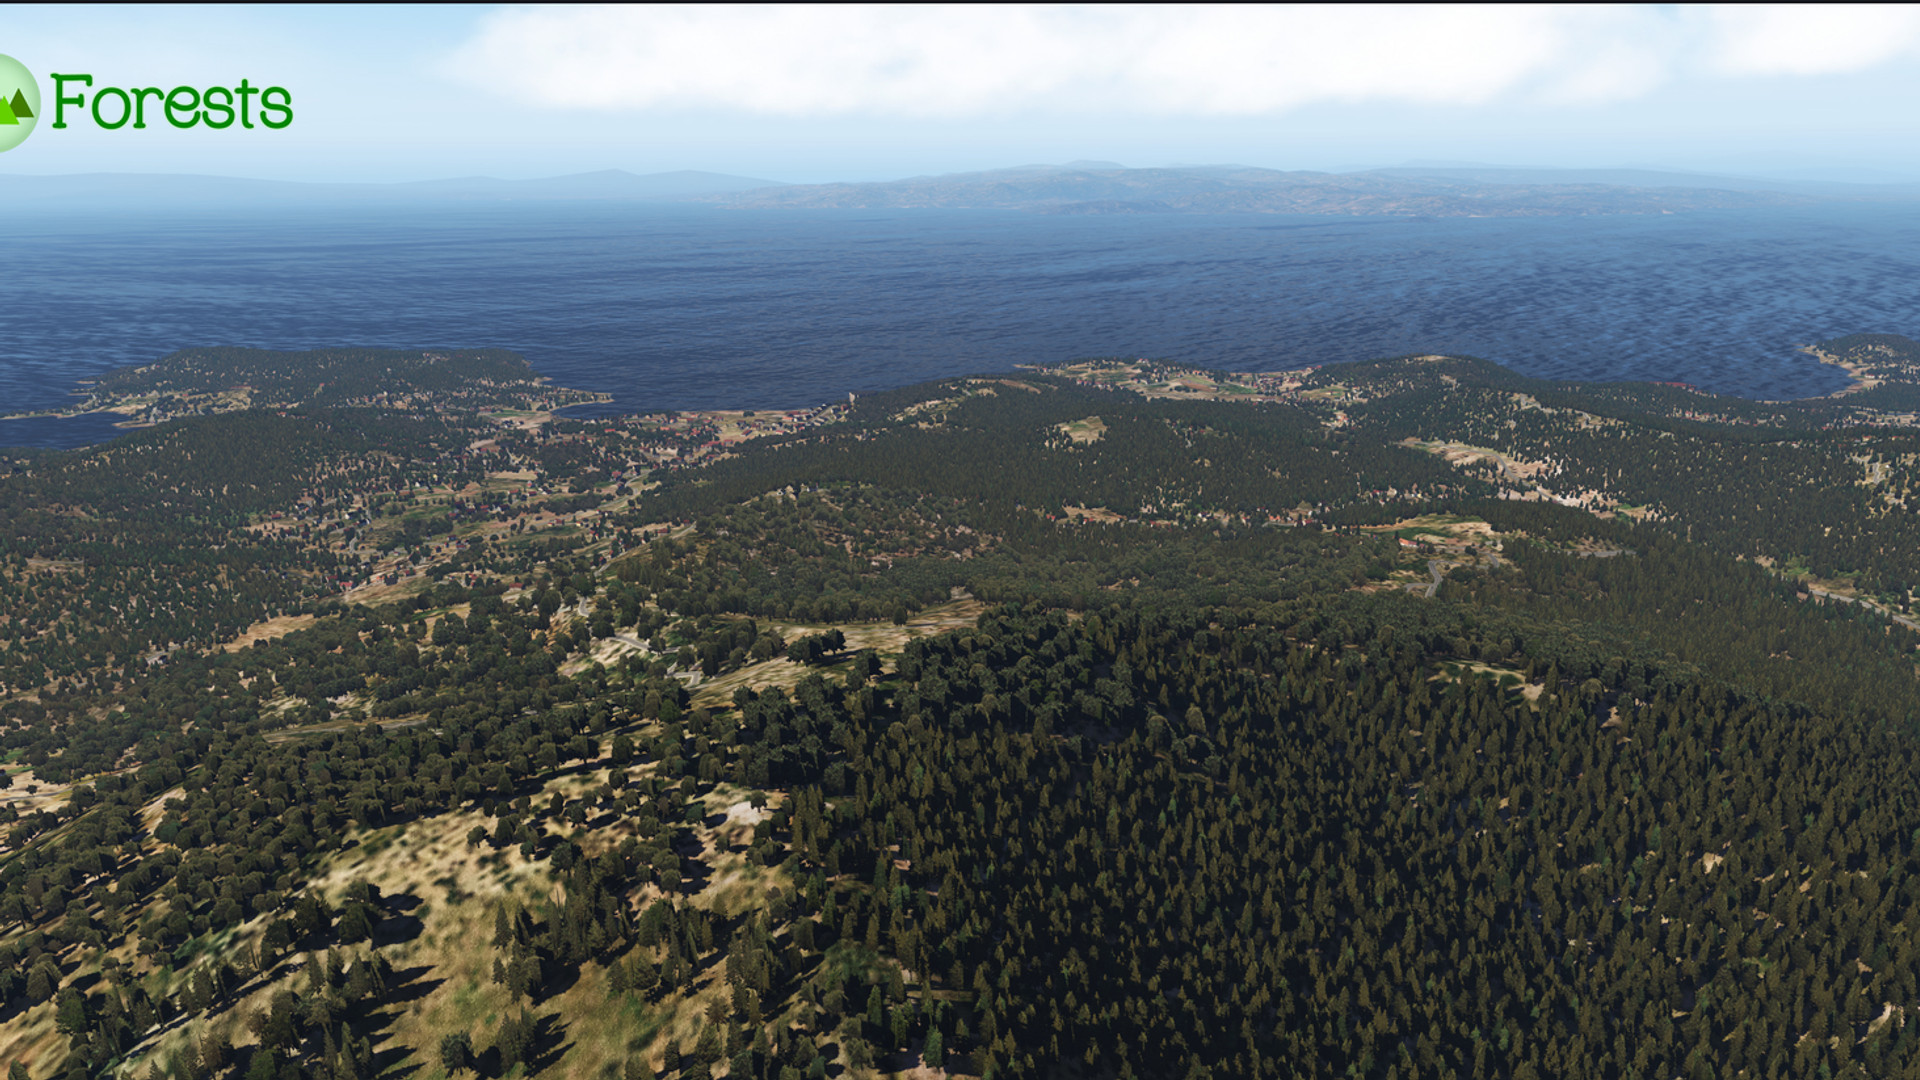 Global_Forests_Greece.jpg